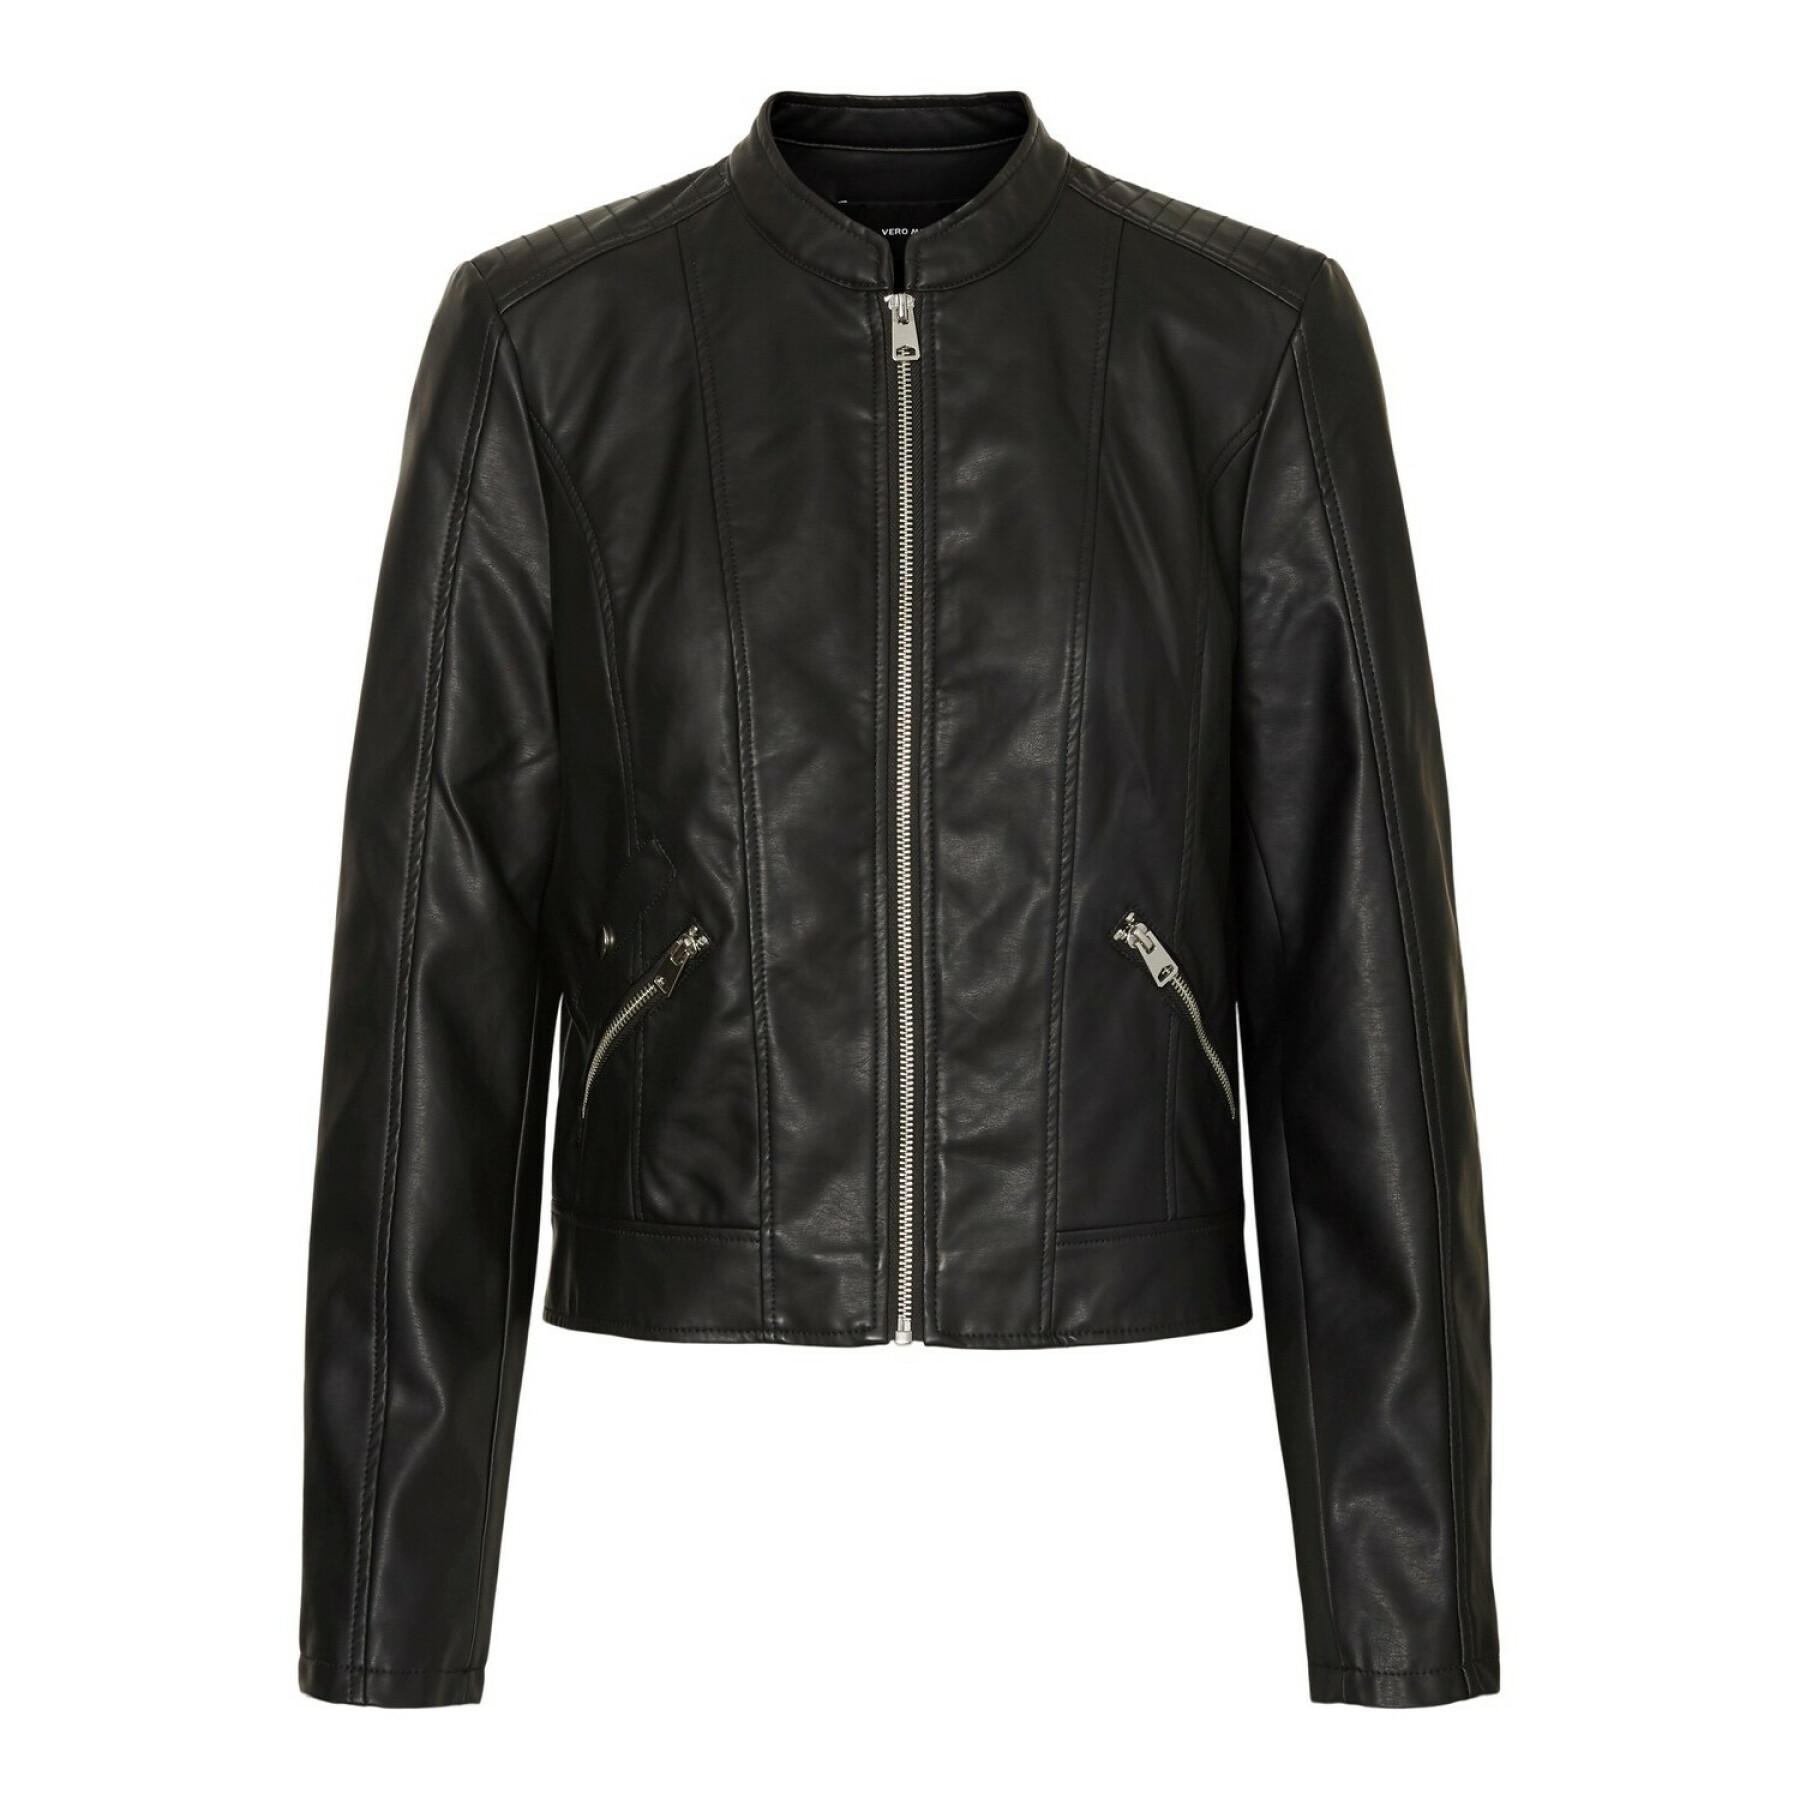 Women's jacket Vero Moda vmkhloe favo coated